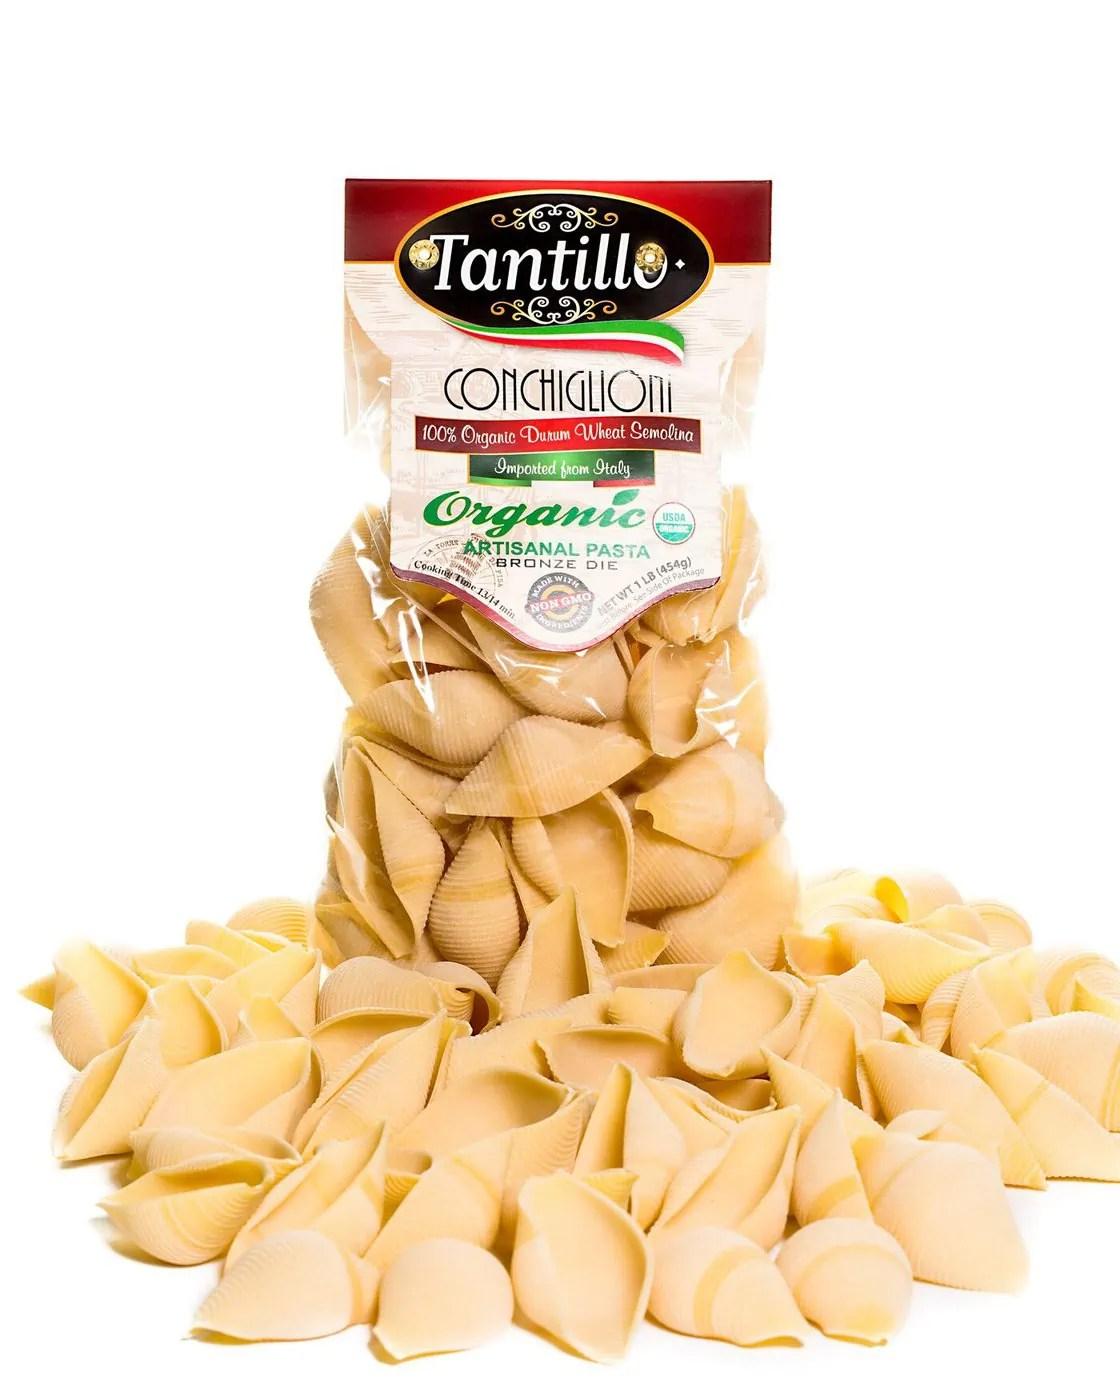 Imported Artisanal Pasta